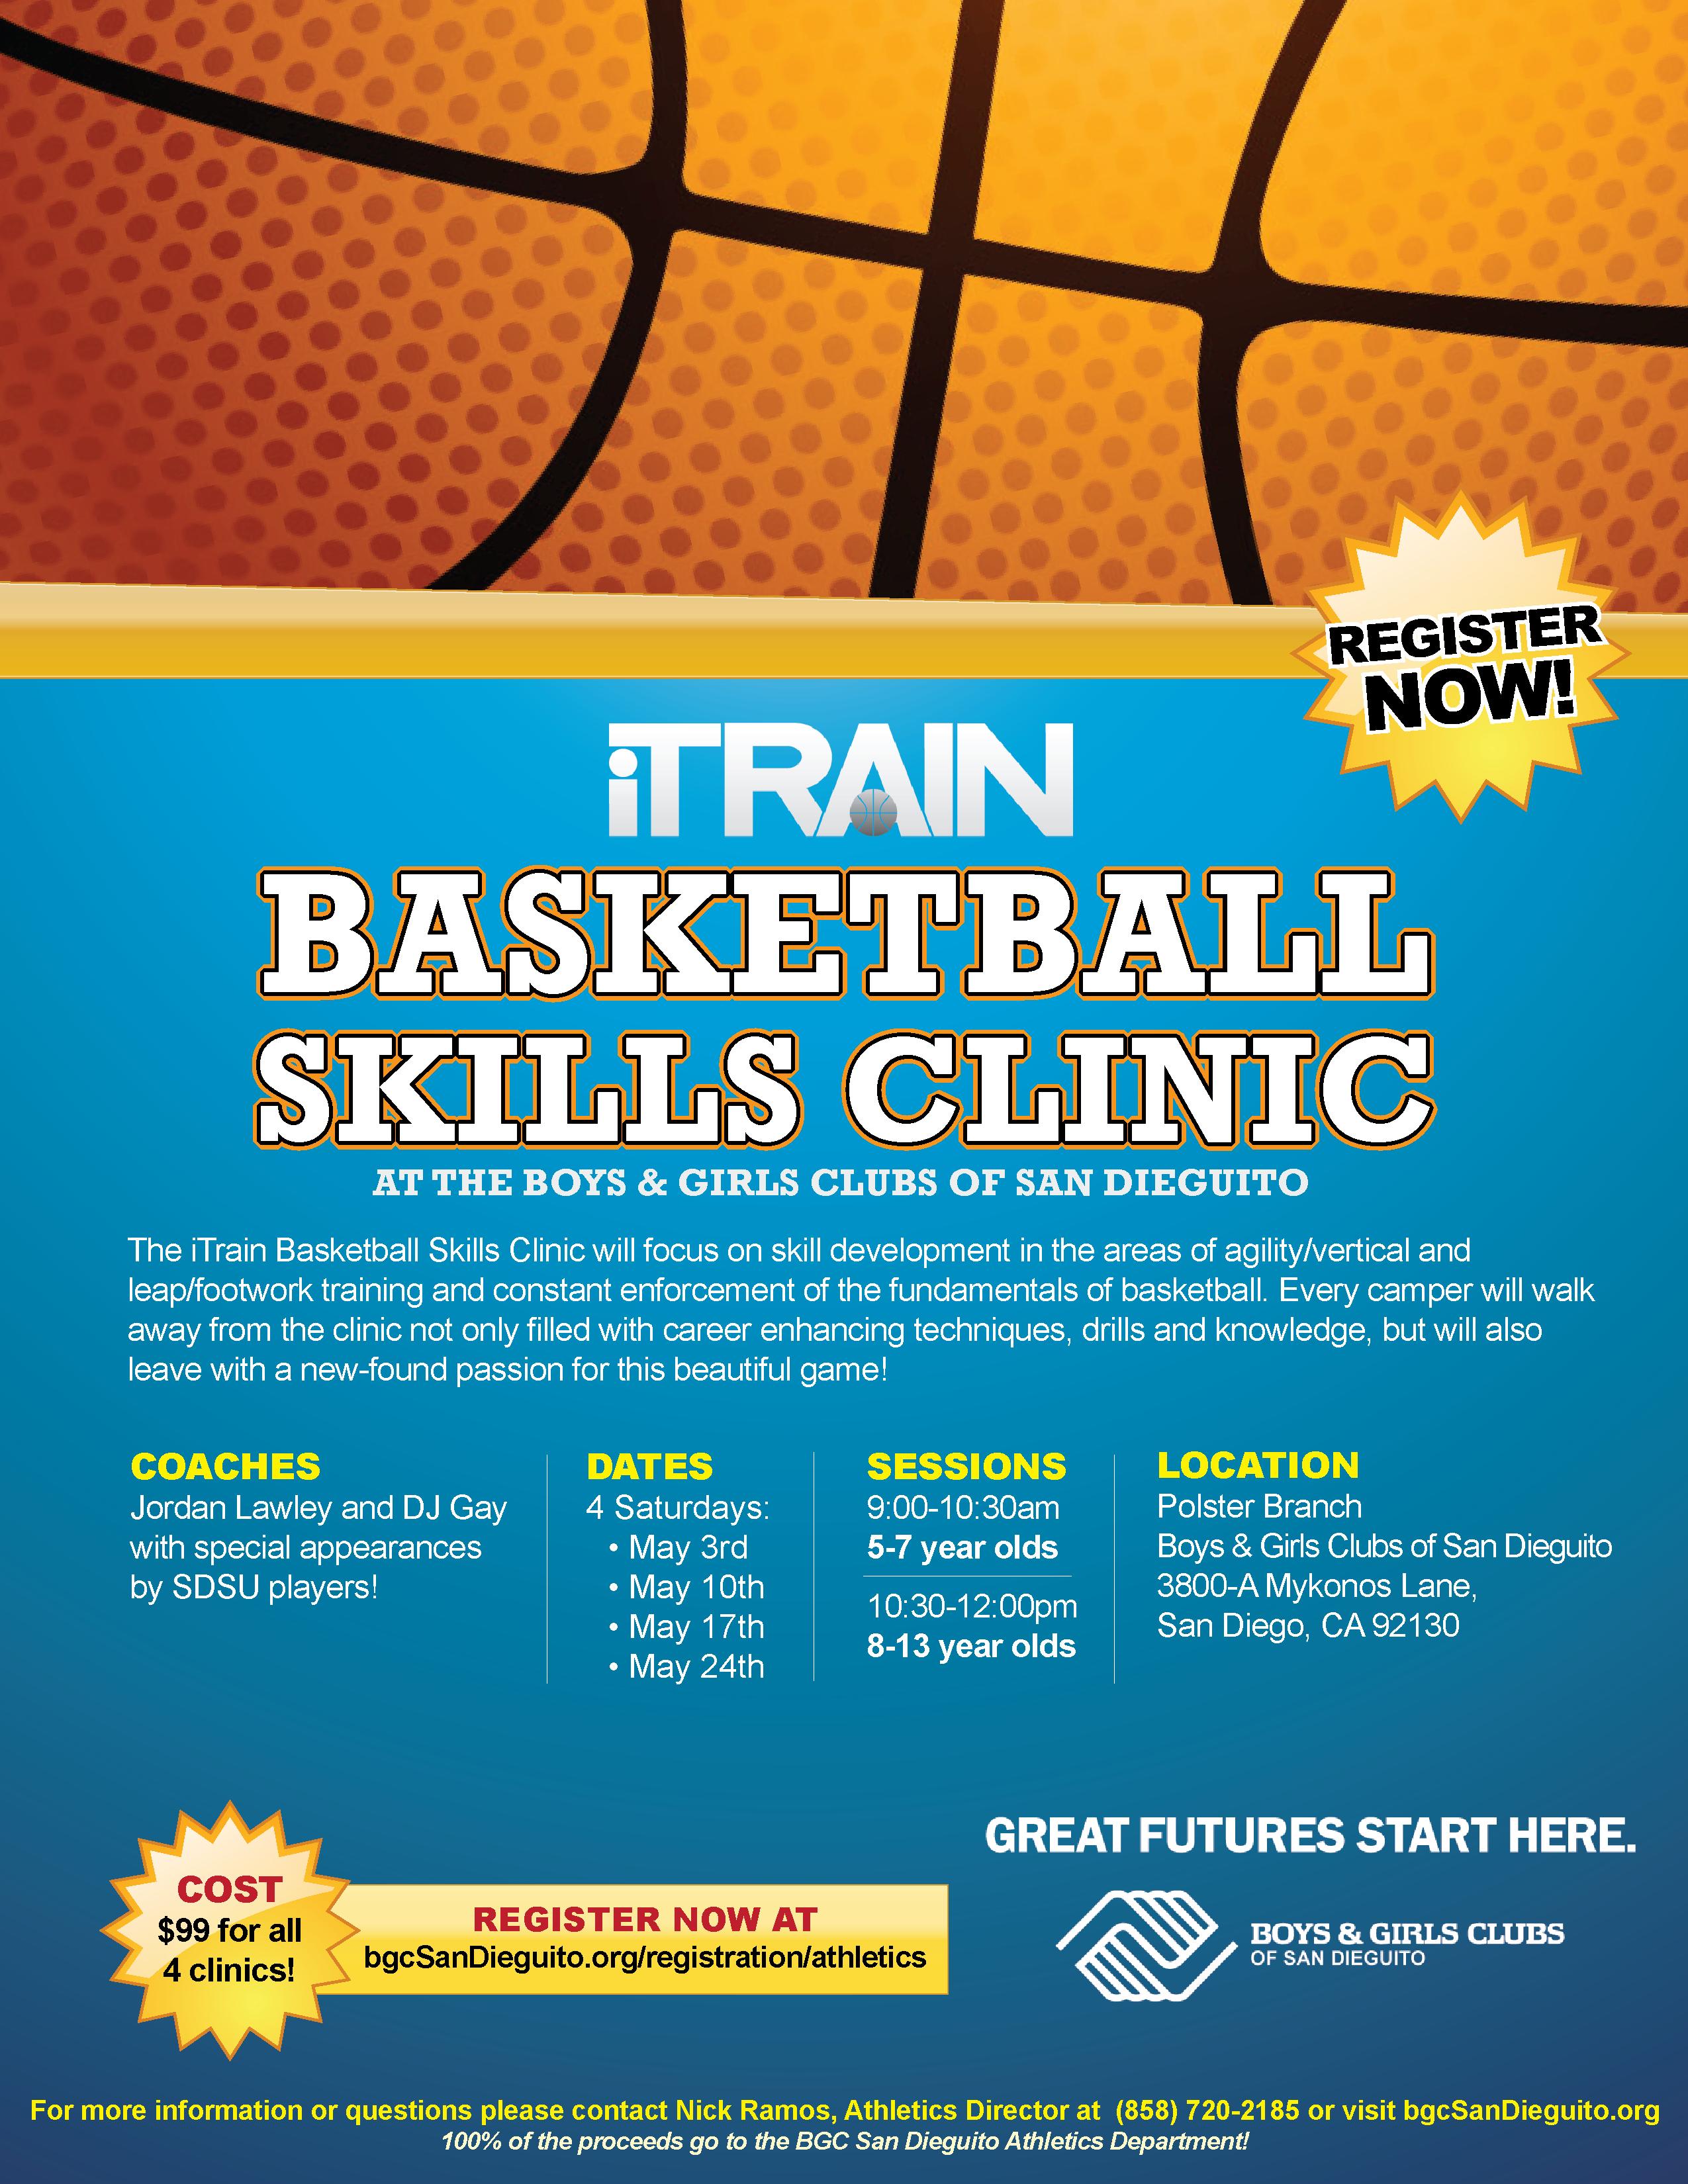 48 Creative Basketball Flyer Template Word Photo with Basketball Flyer Template Word